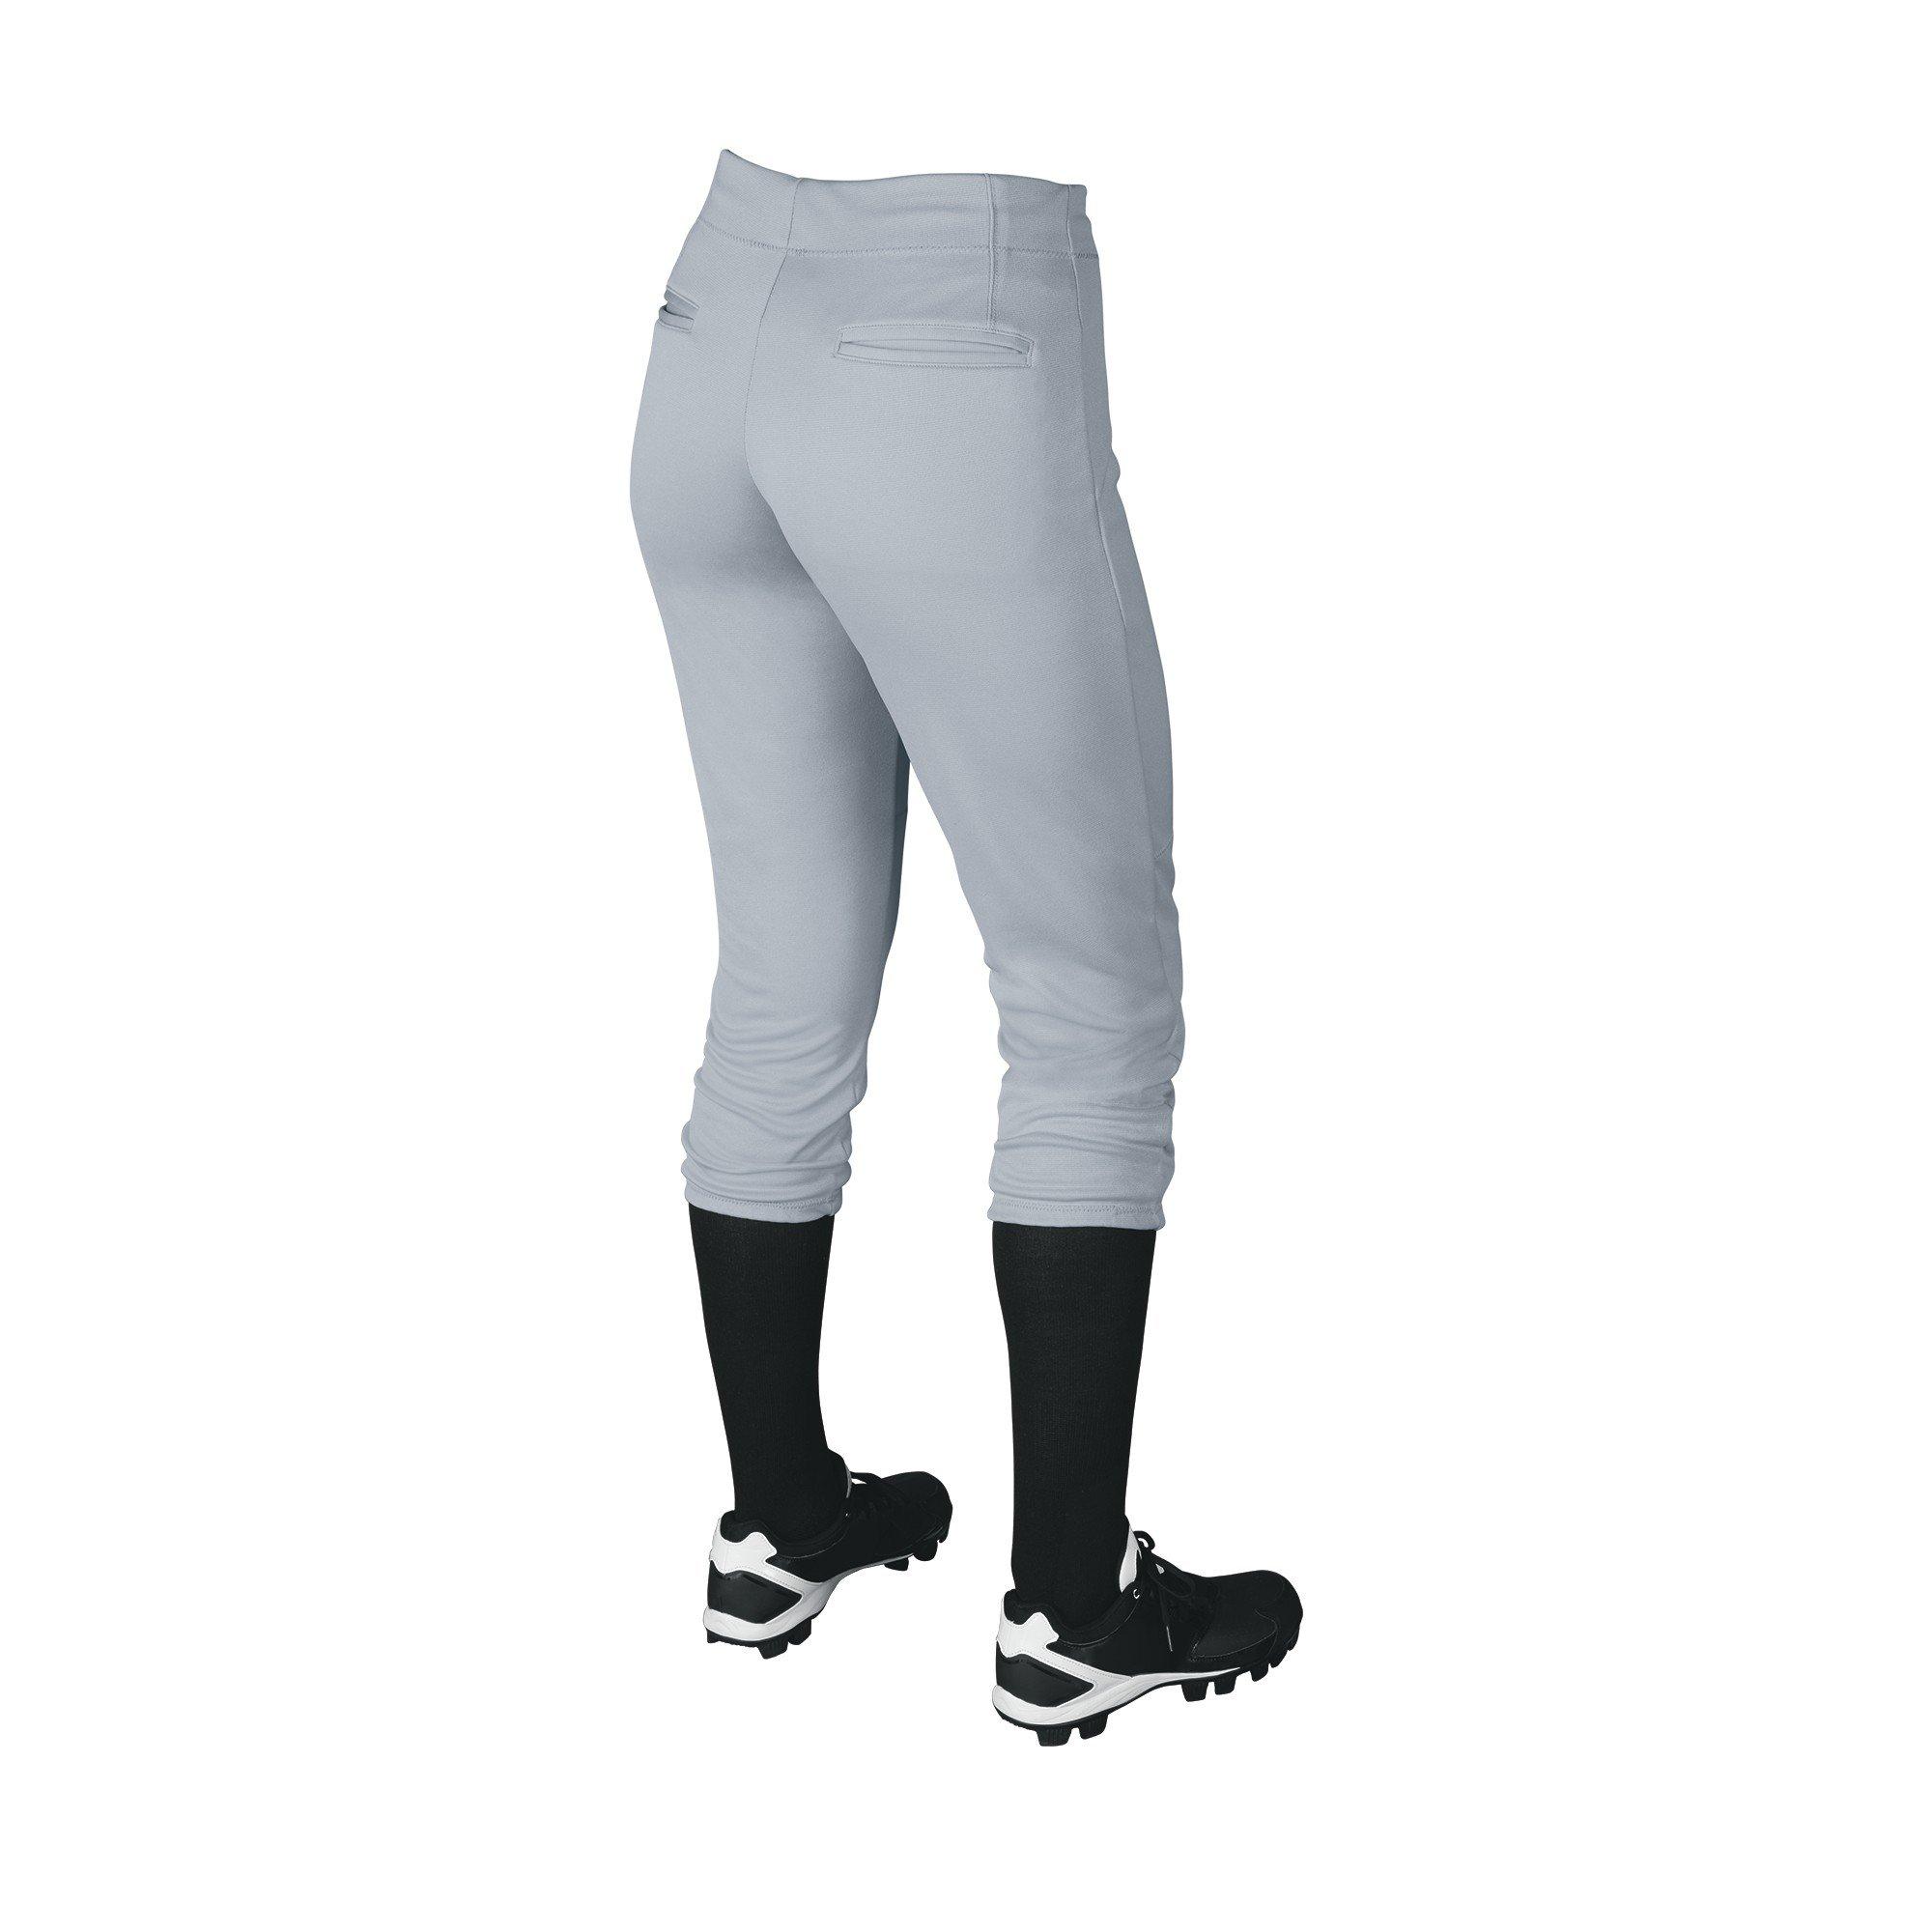 DeMarini Womens Sleek Pull Up Pant, Blue Grey, Medium by DeMarini (Image #2)